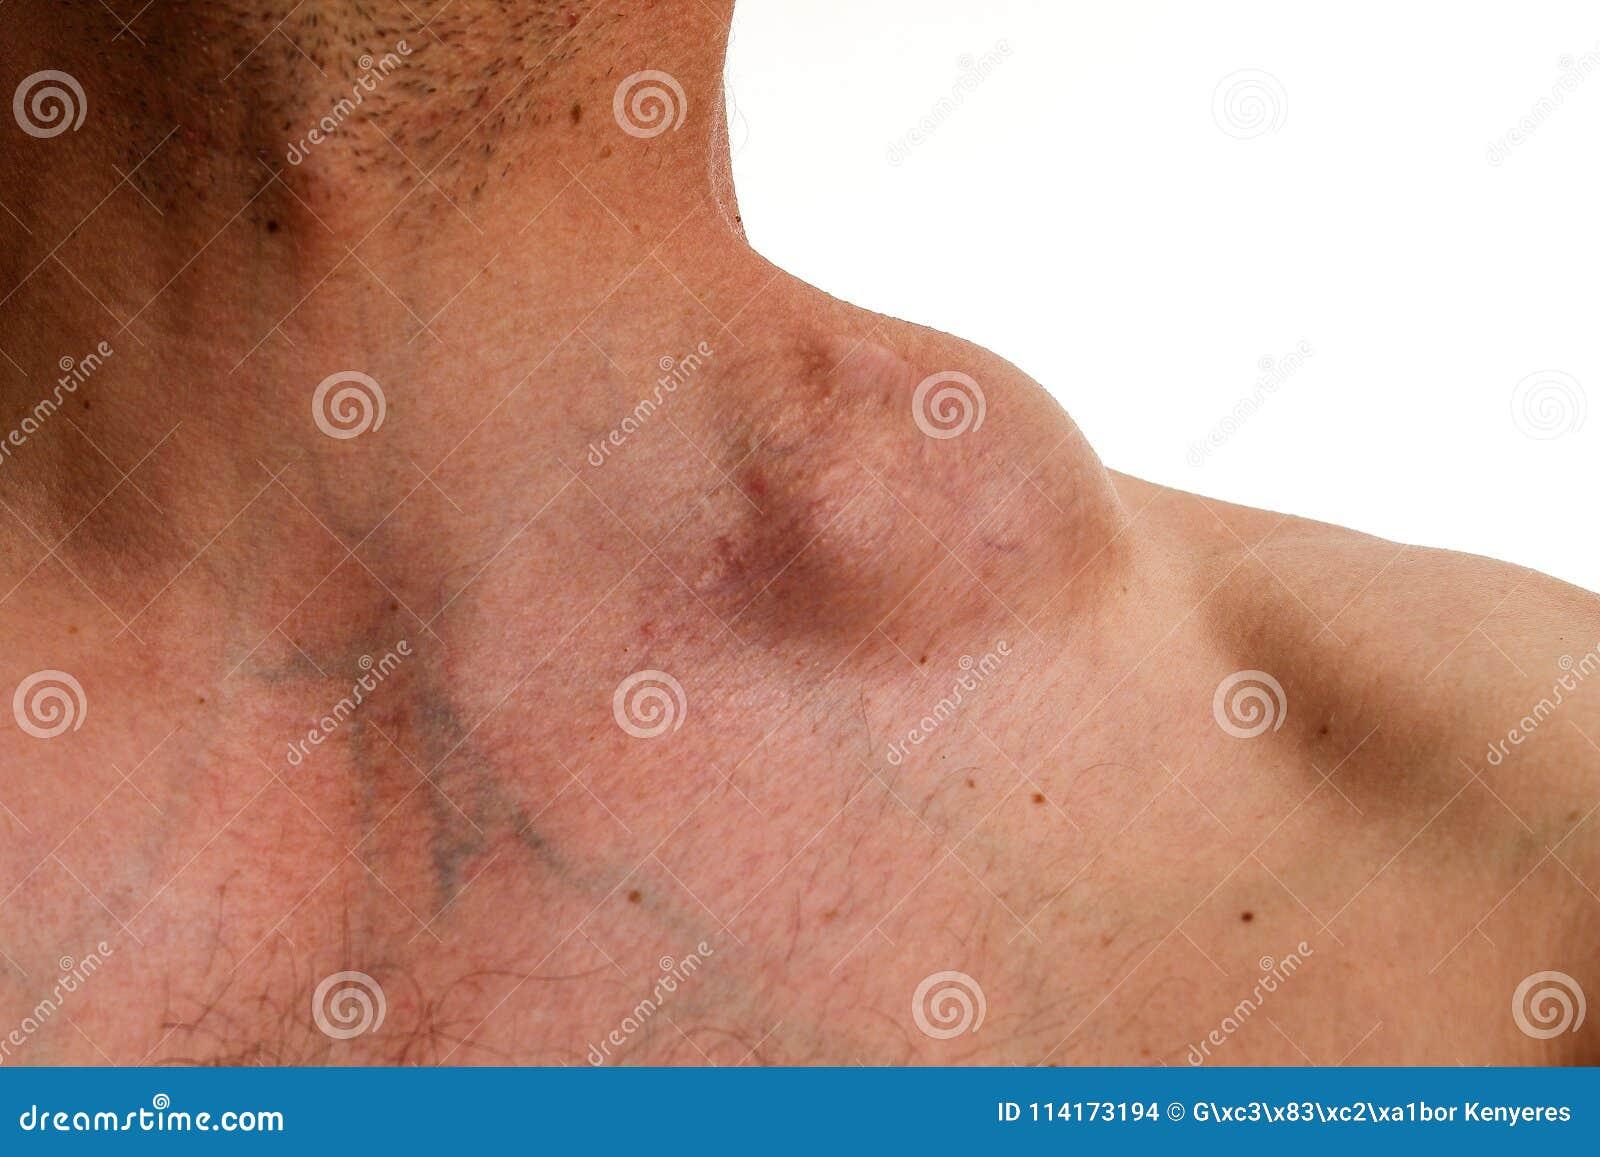 cancer hodgkinien